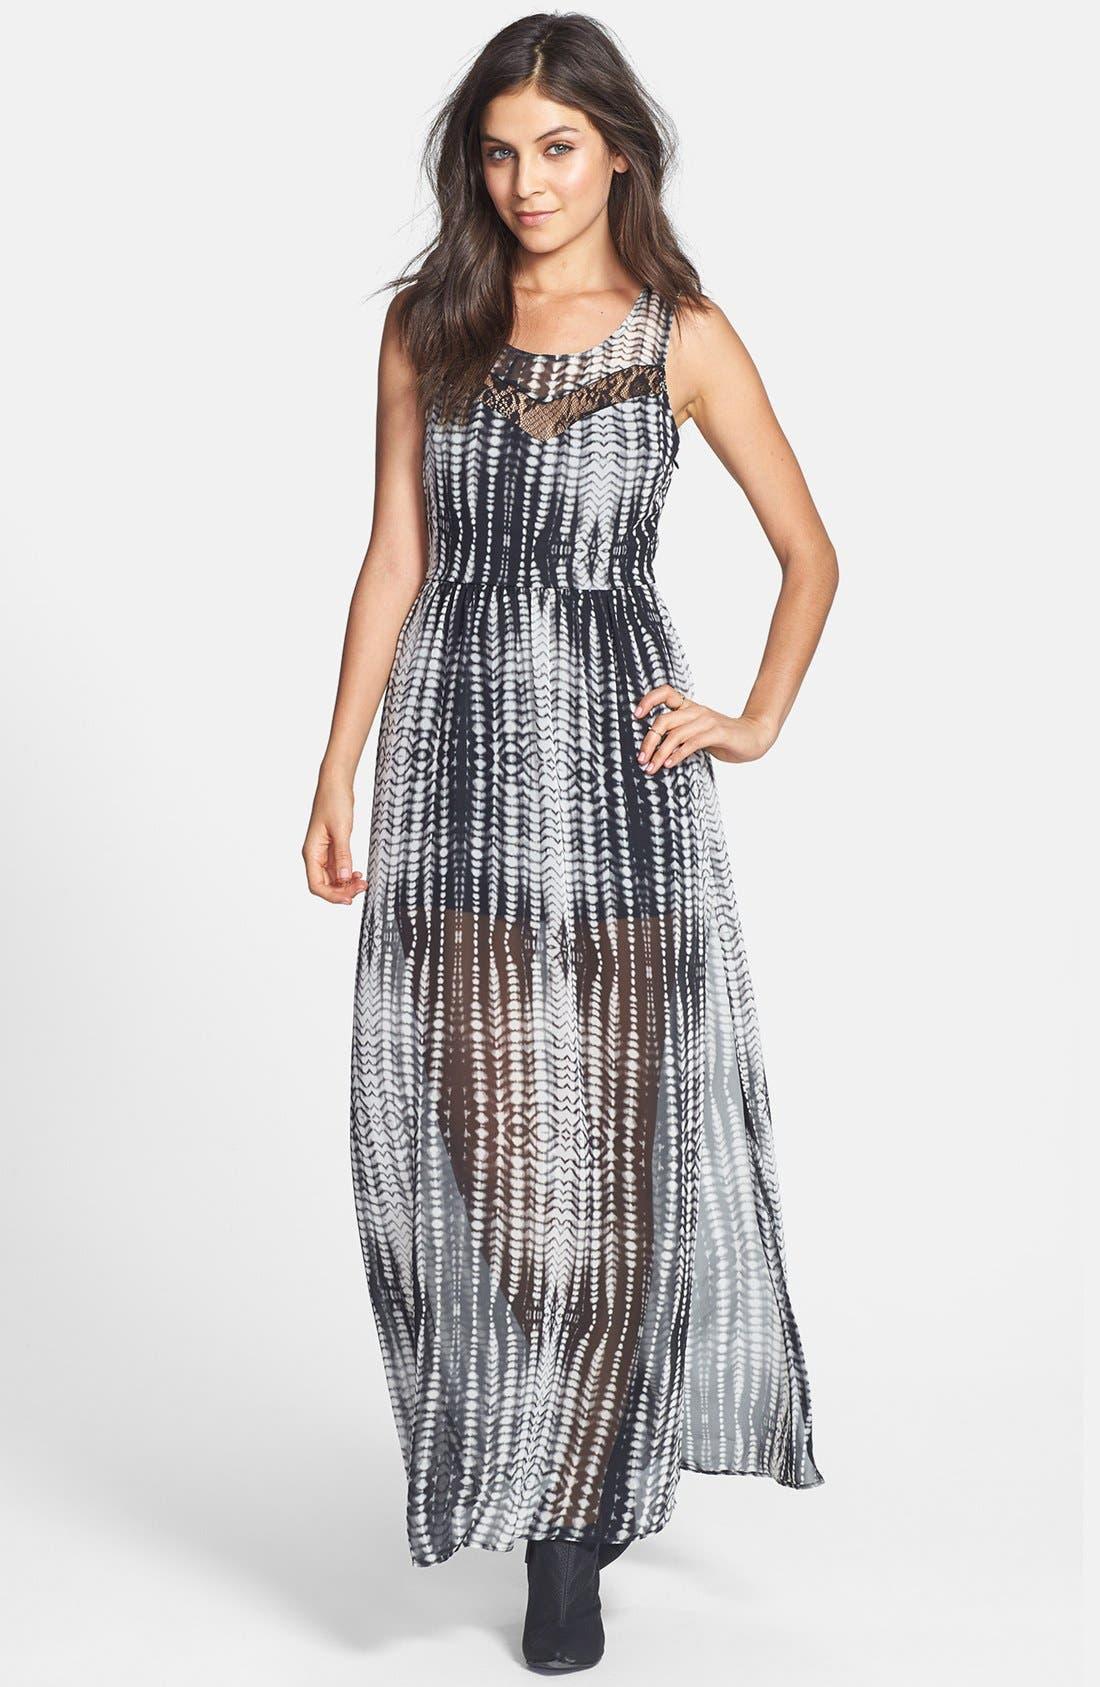 Alternate Image 1 Selected - Lush Lace Inset Print Maxi Dress (Juniors)